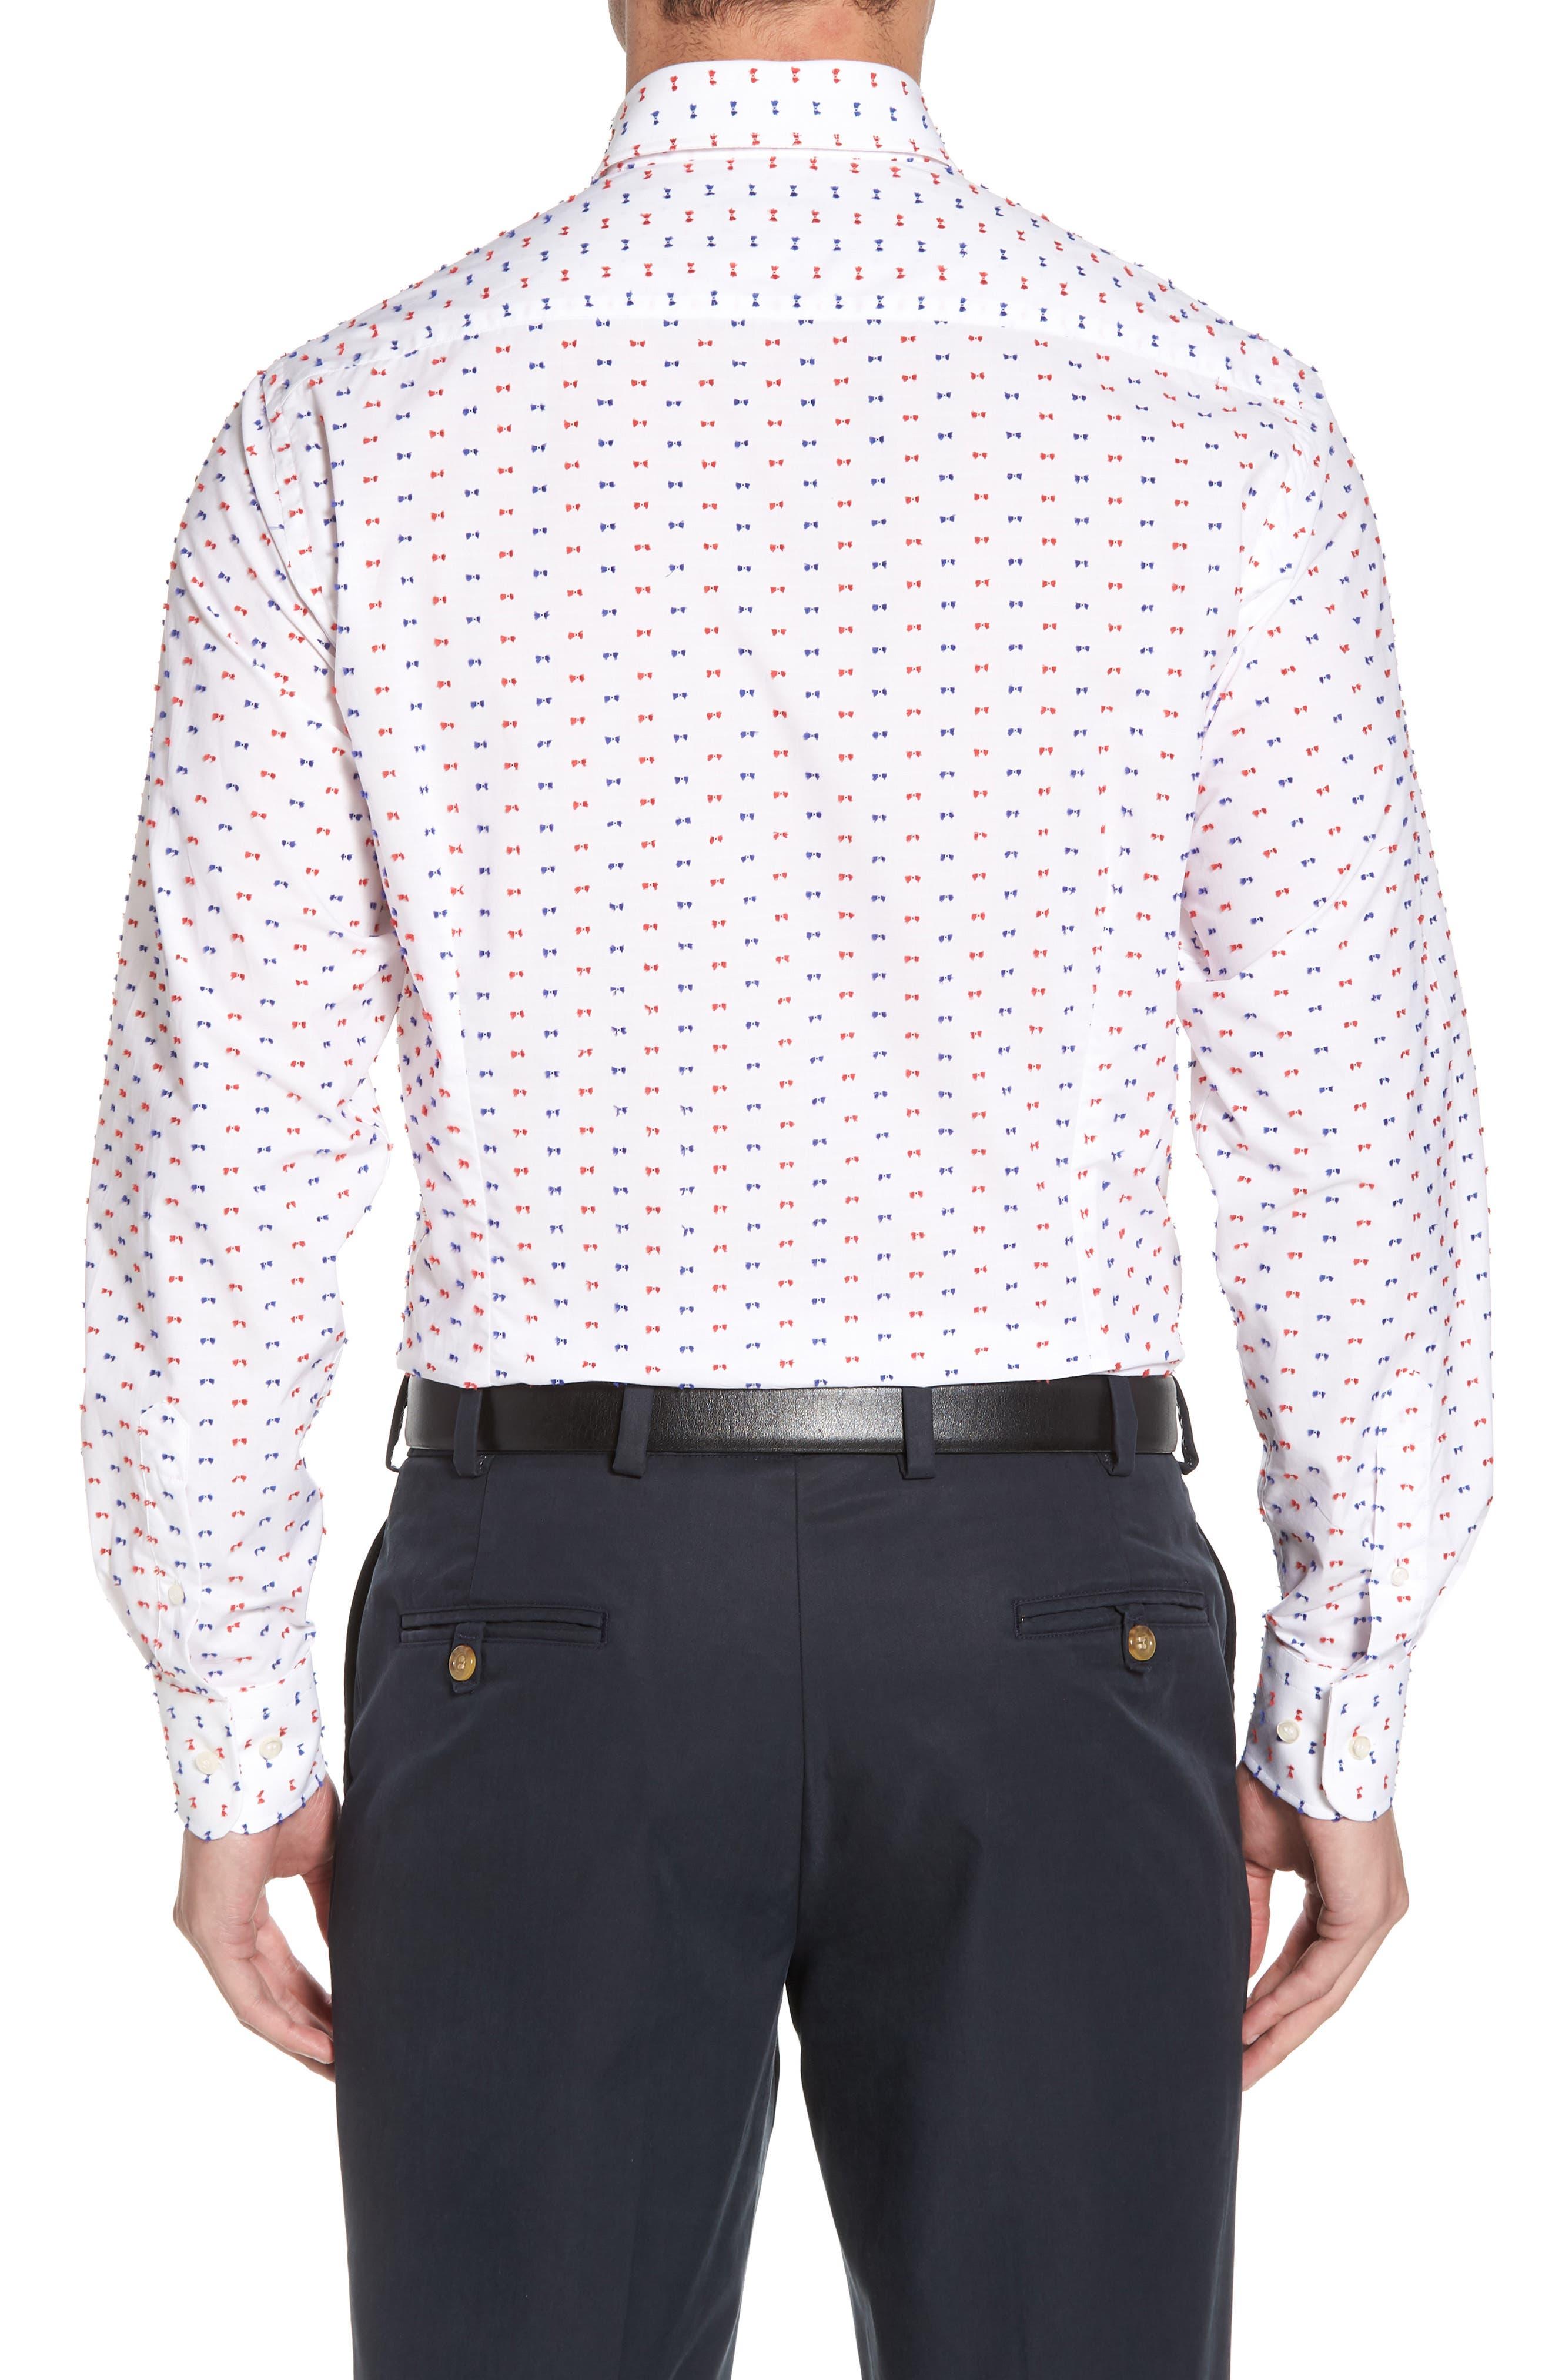 Paul&Shark Regular Fit Feathered Sport Shirt,                             Alternate thumbnail 2, color,